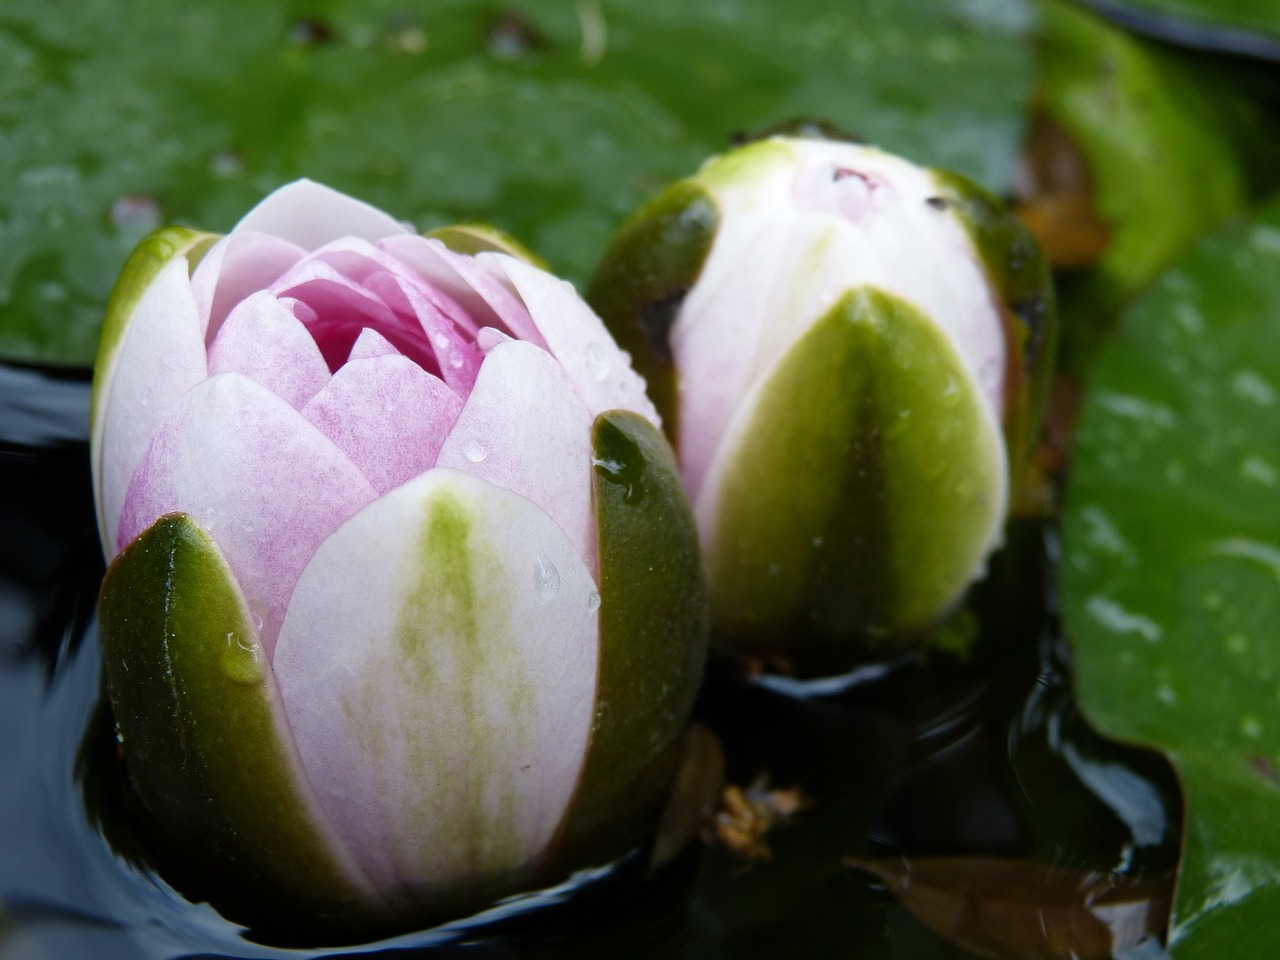 Seerosenblteclosed Flowerpond Flower Free Photo From Needpix